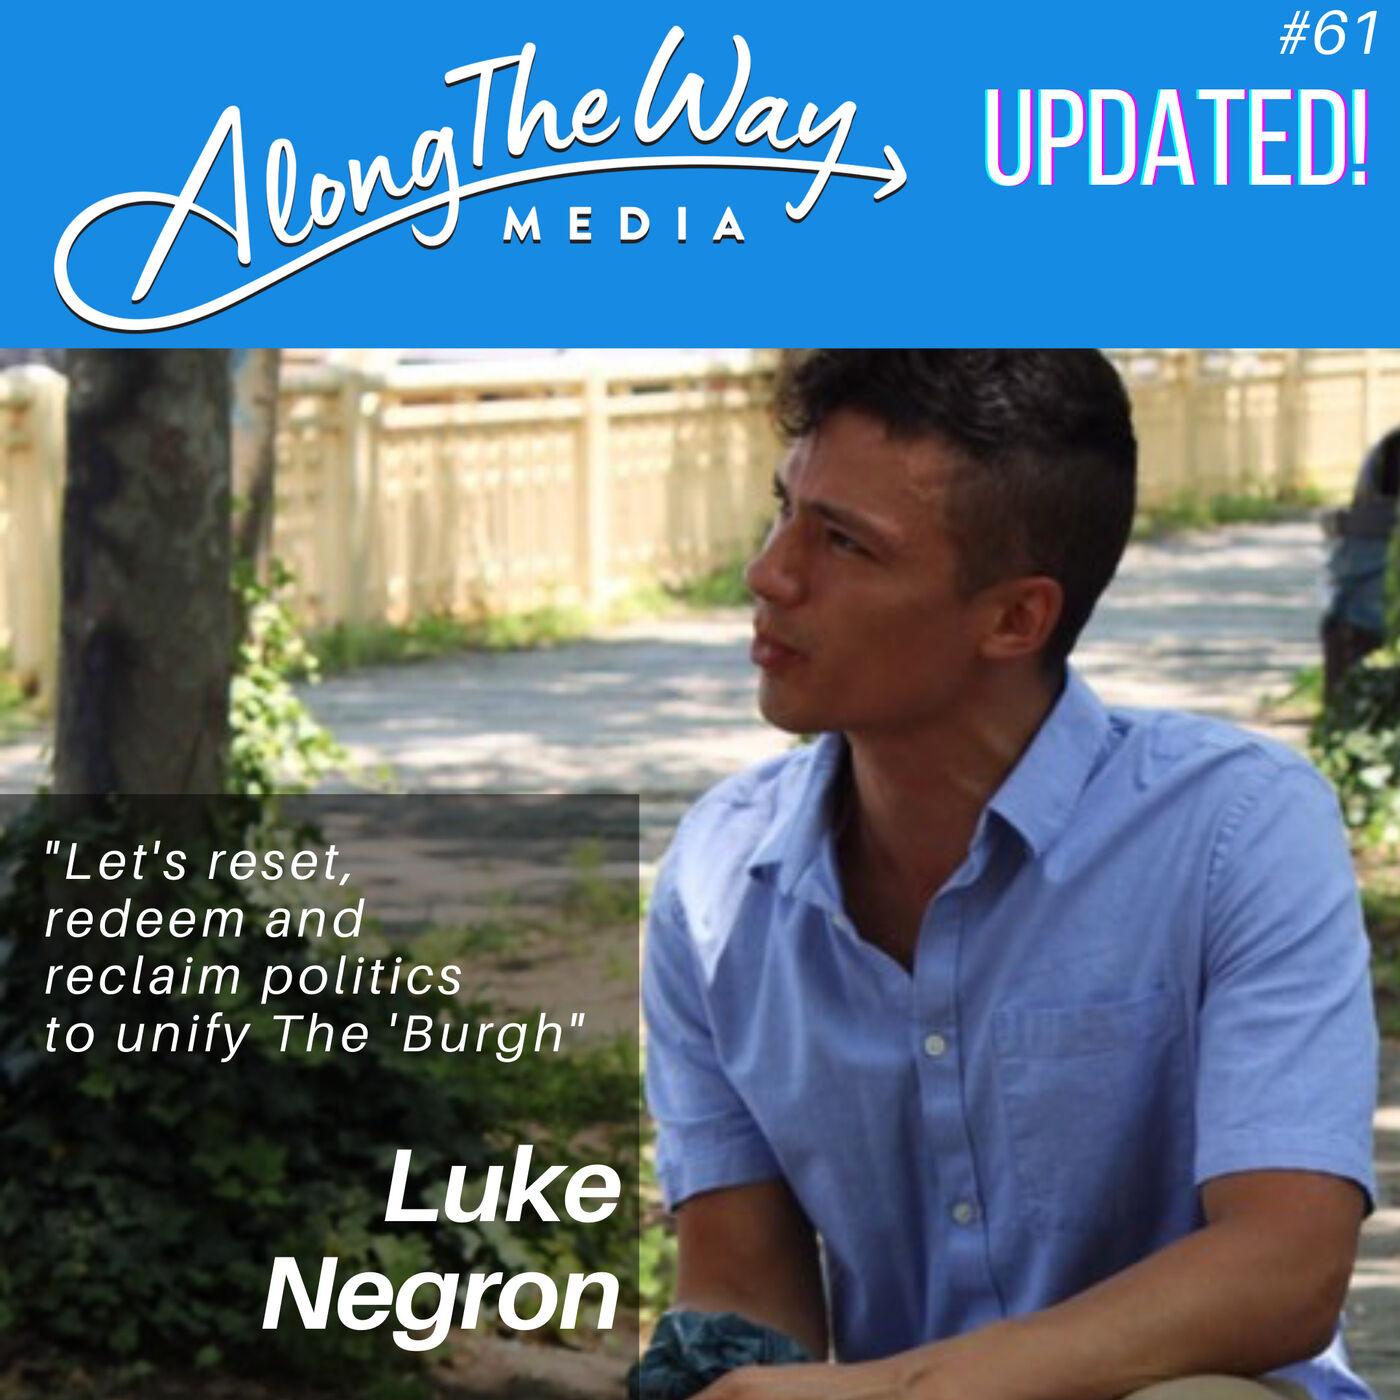 UPDATED - Unifying the Burgh - Luke Negron AlongTheWay 61